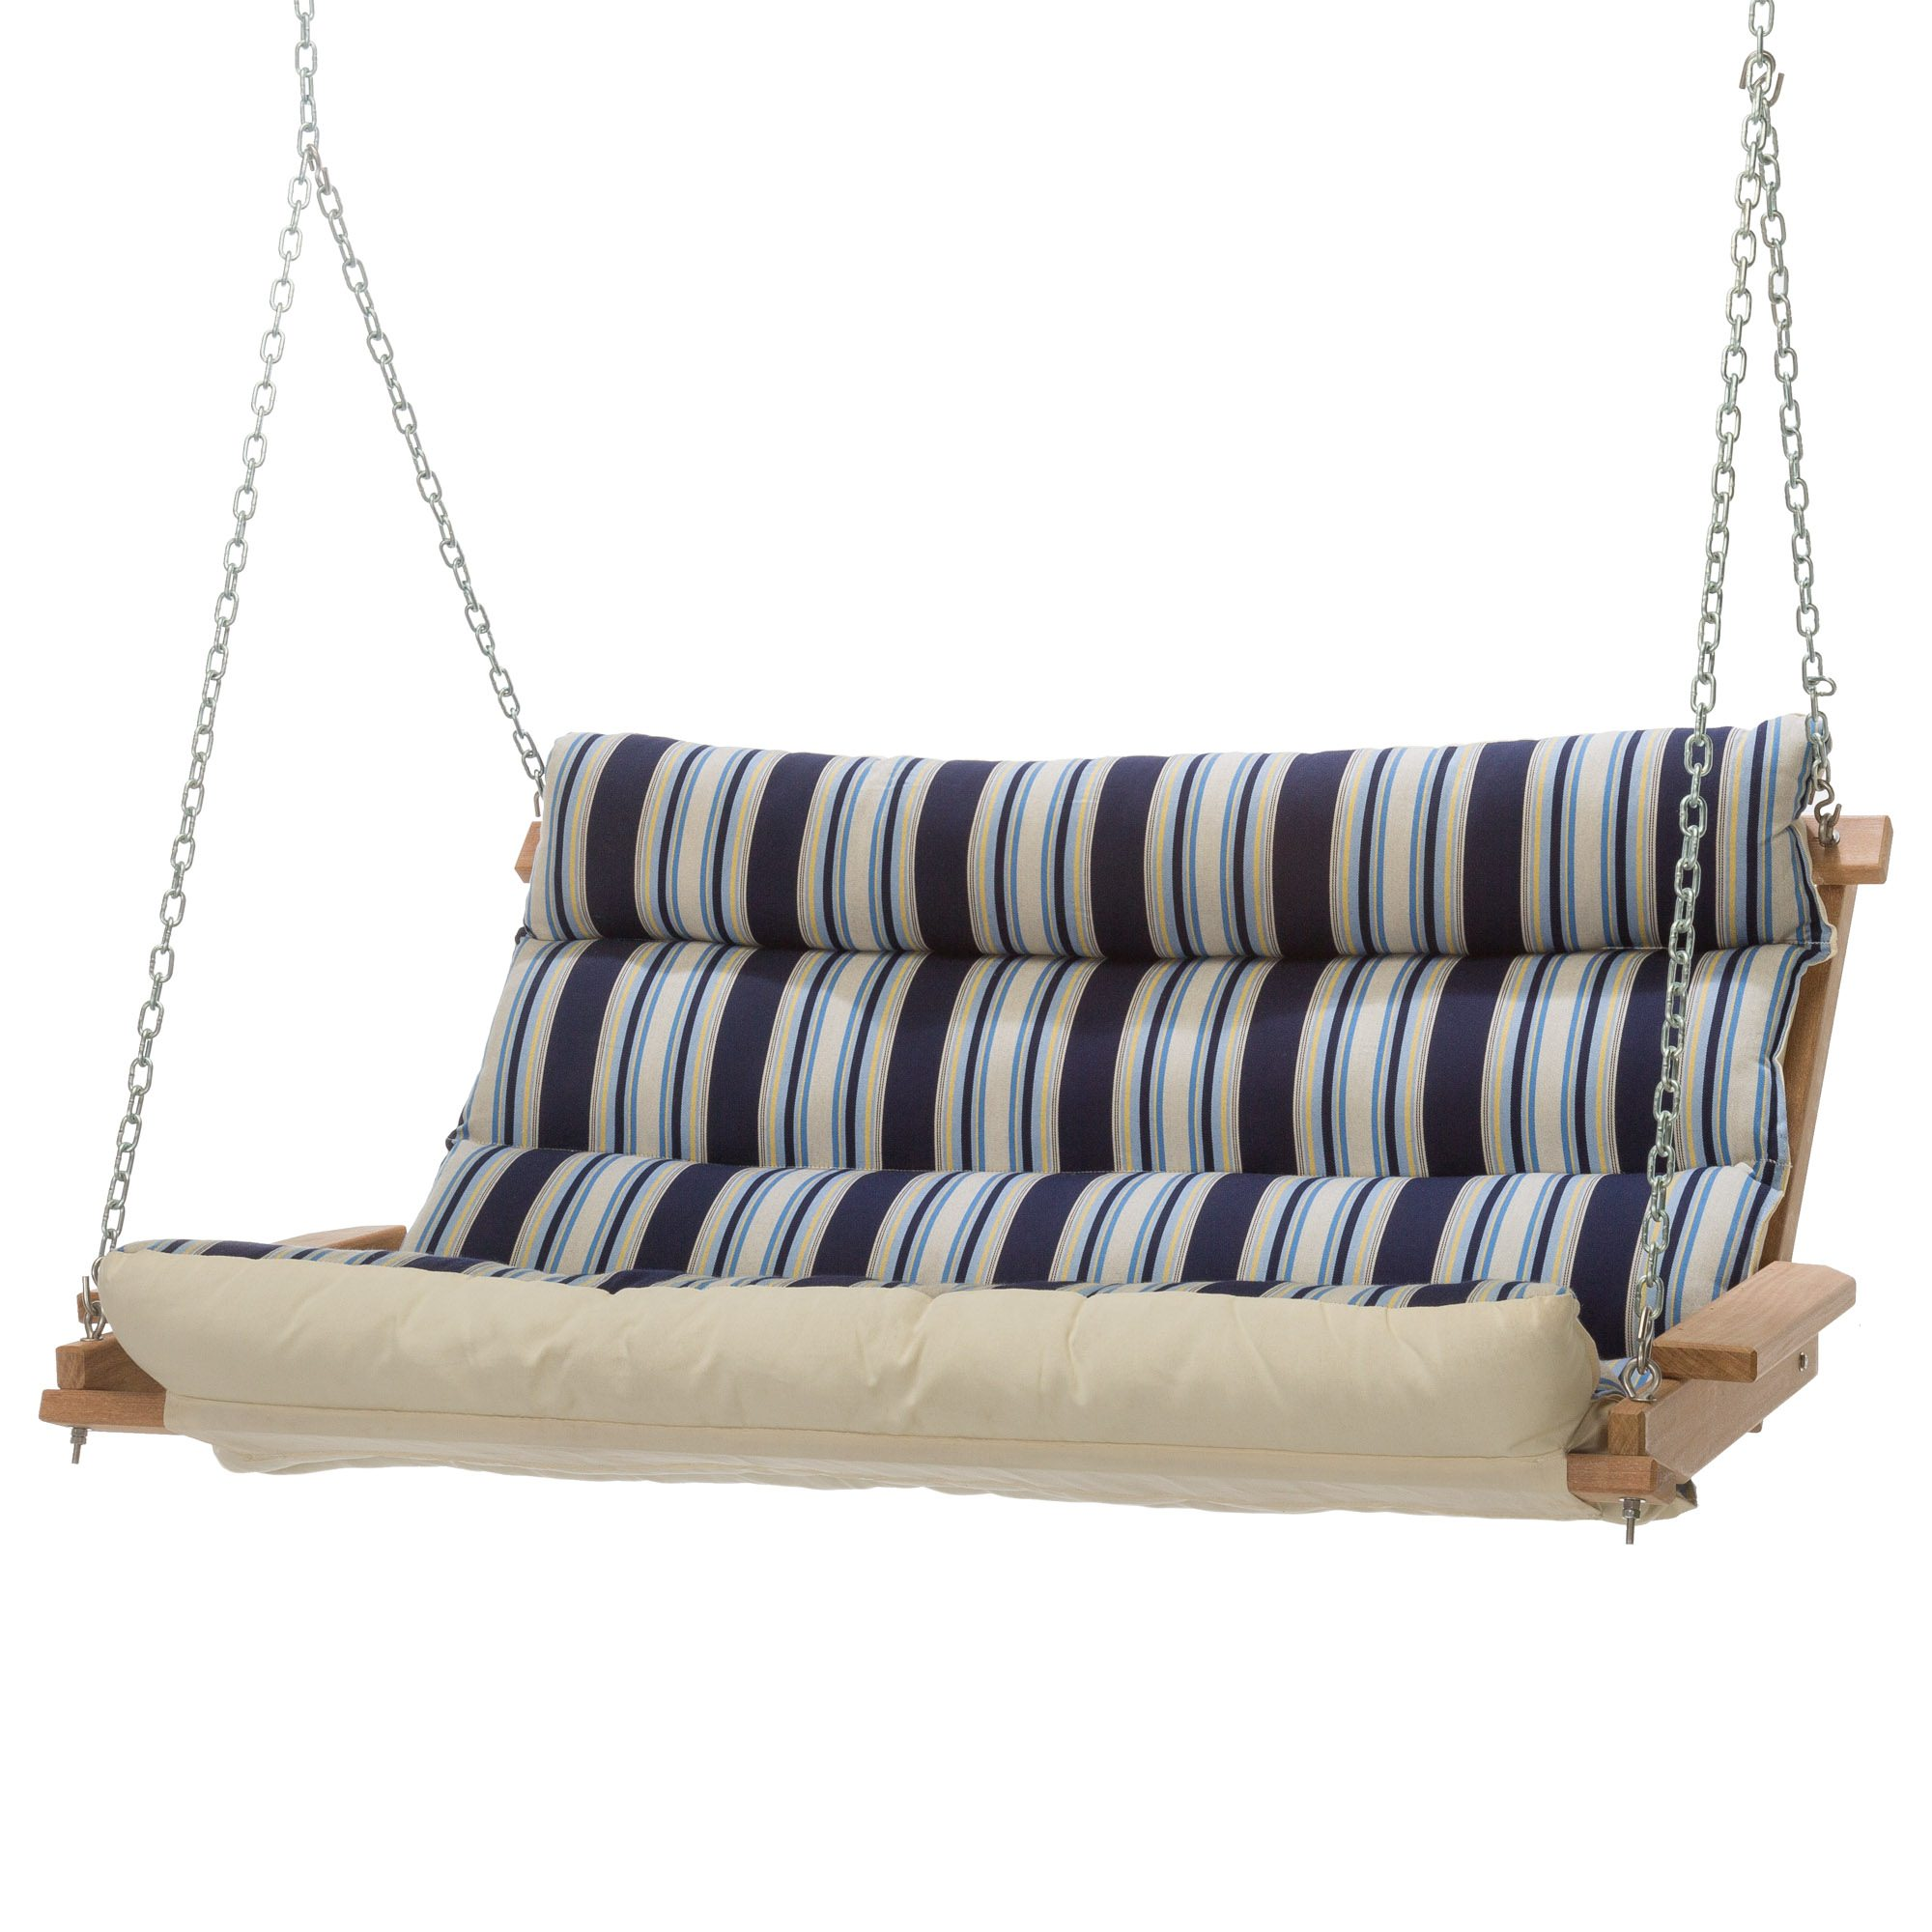 Shop Cushion Swing Replacement Hardware